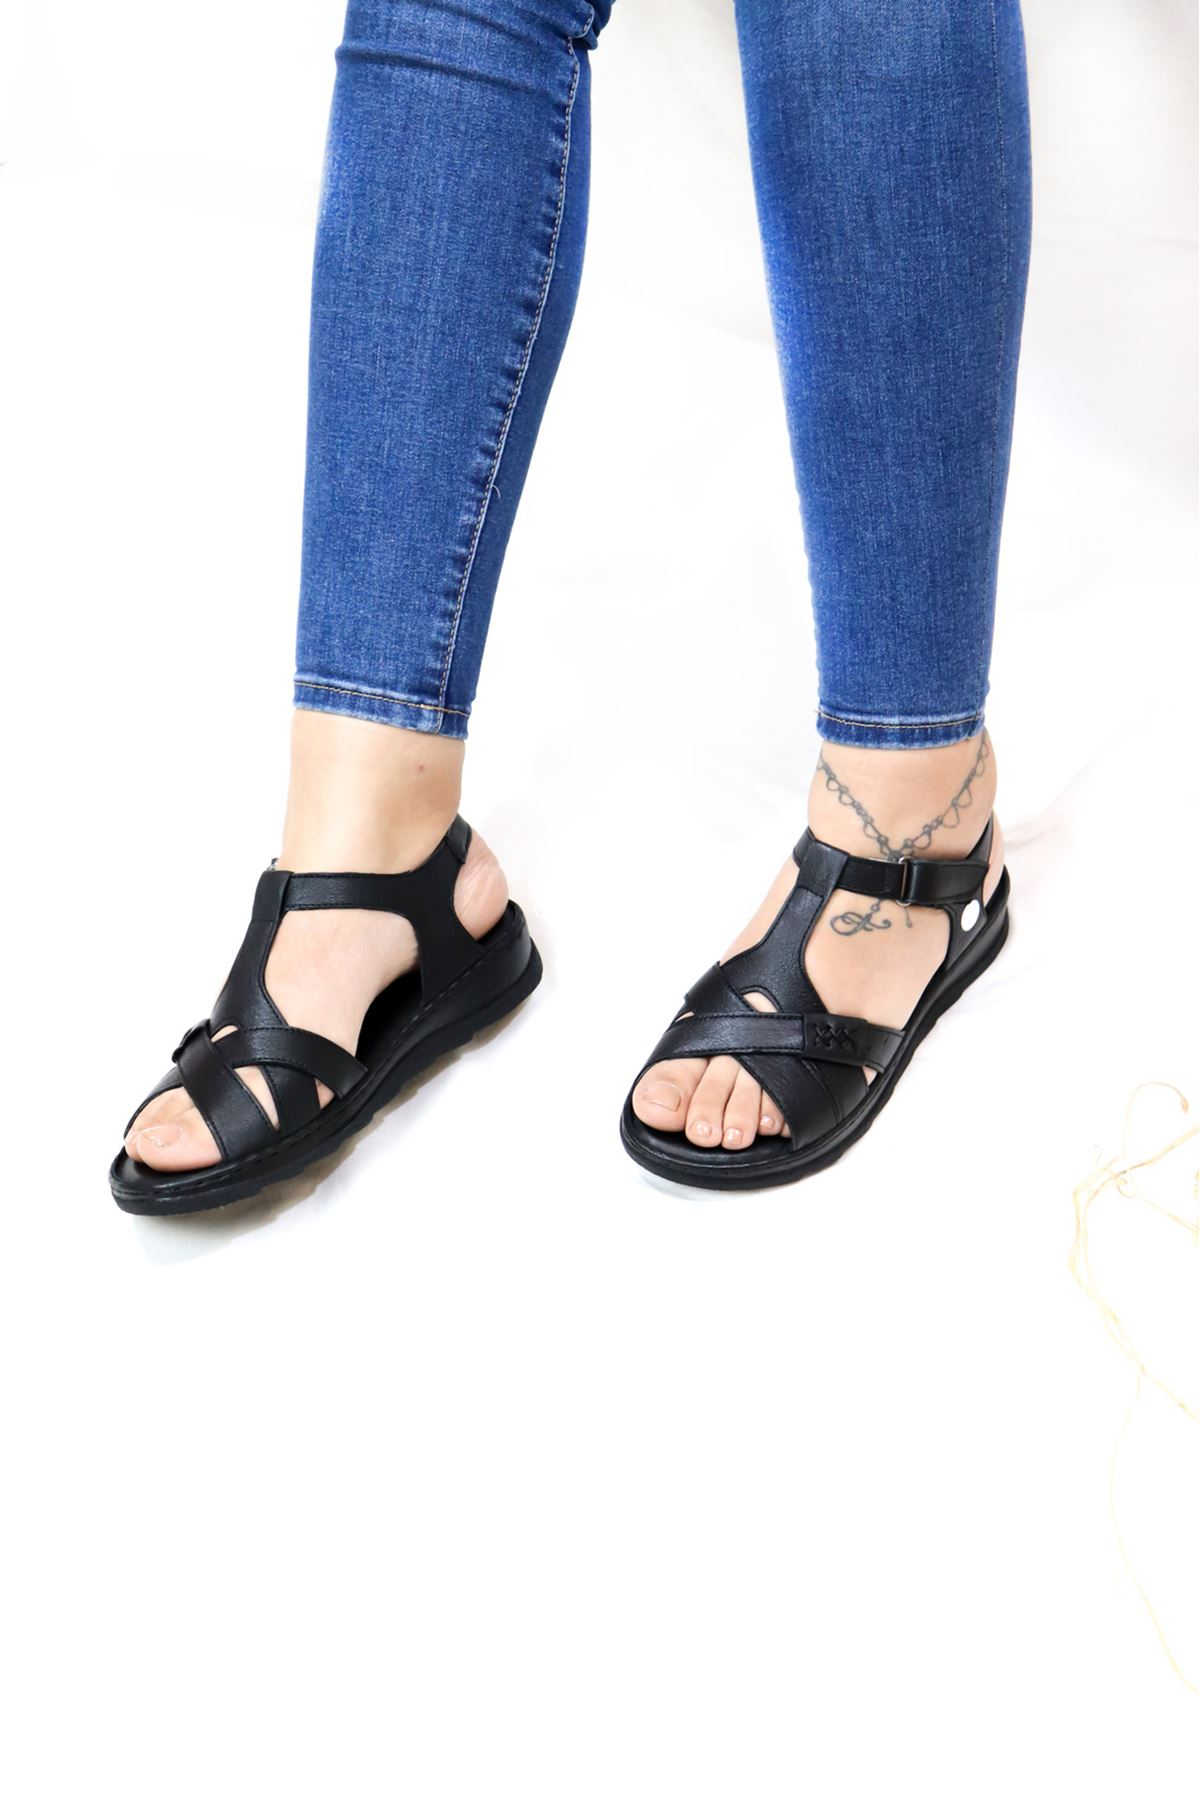 Mammamia - D21YS -1145-B Siyah Kadın Sandalet